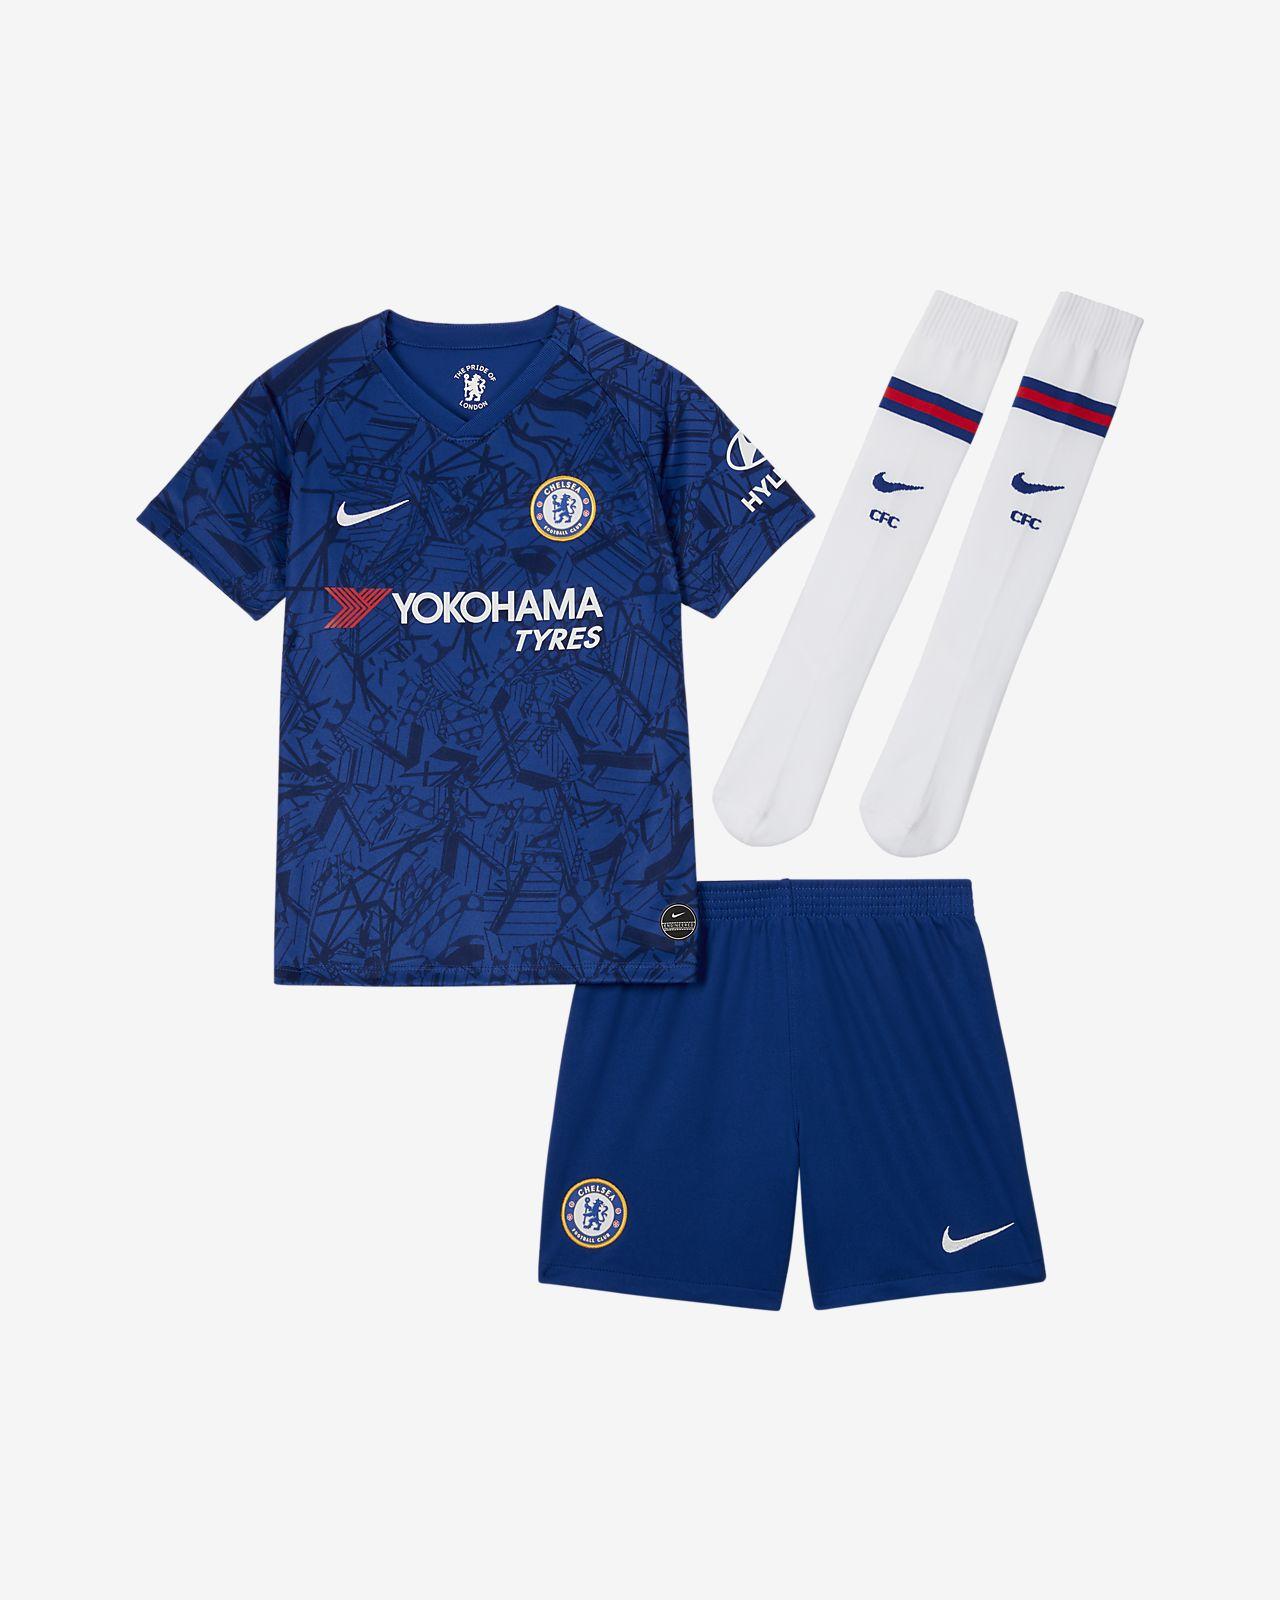 Kit de fútbol para niños talla pequeña Chelsea FC Stadium 2019/20 de local